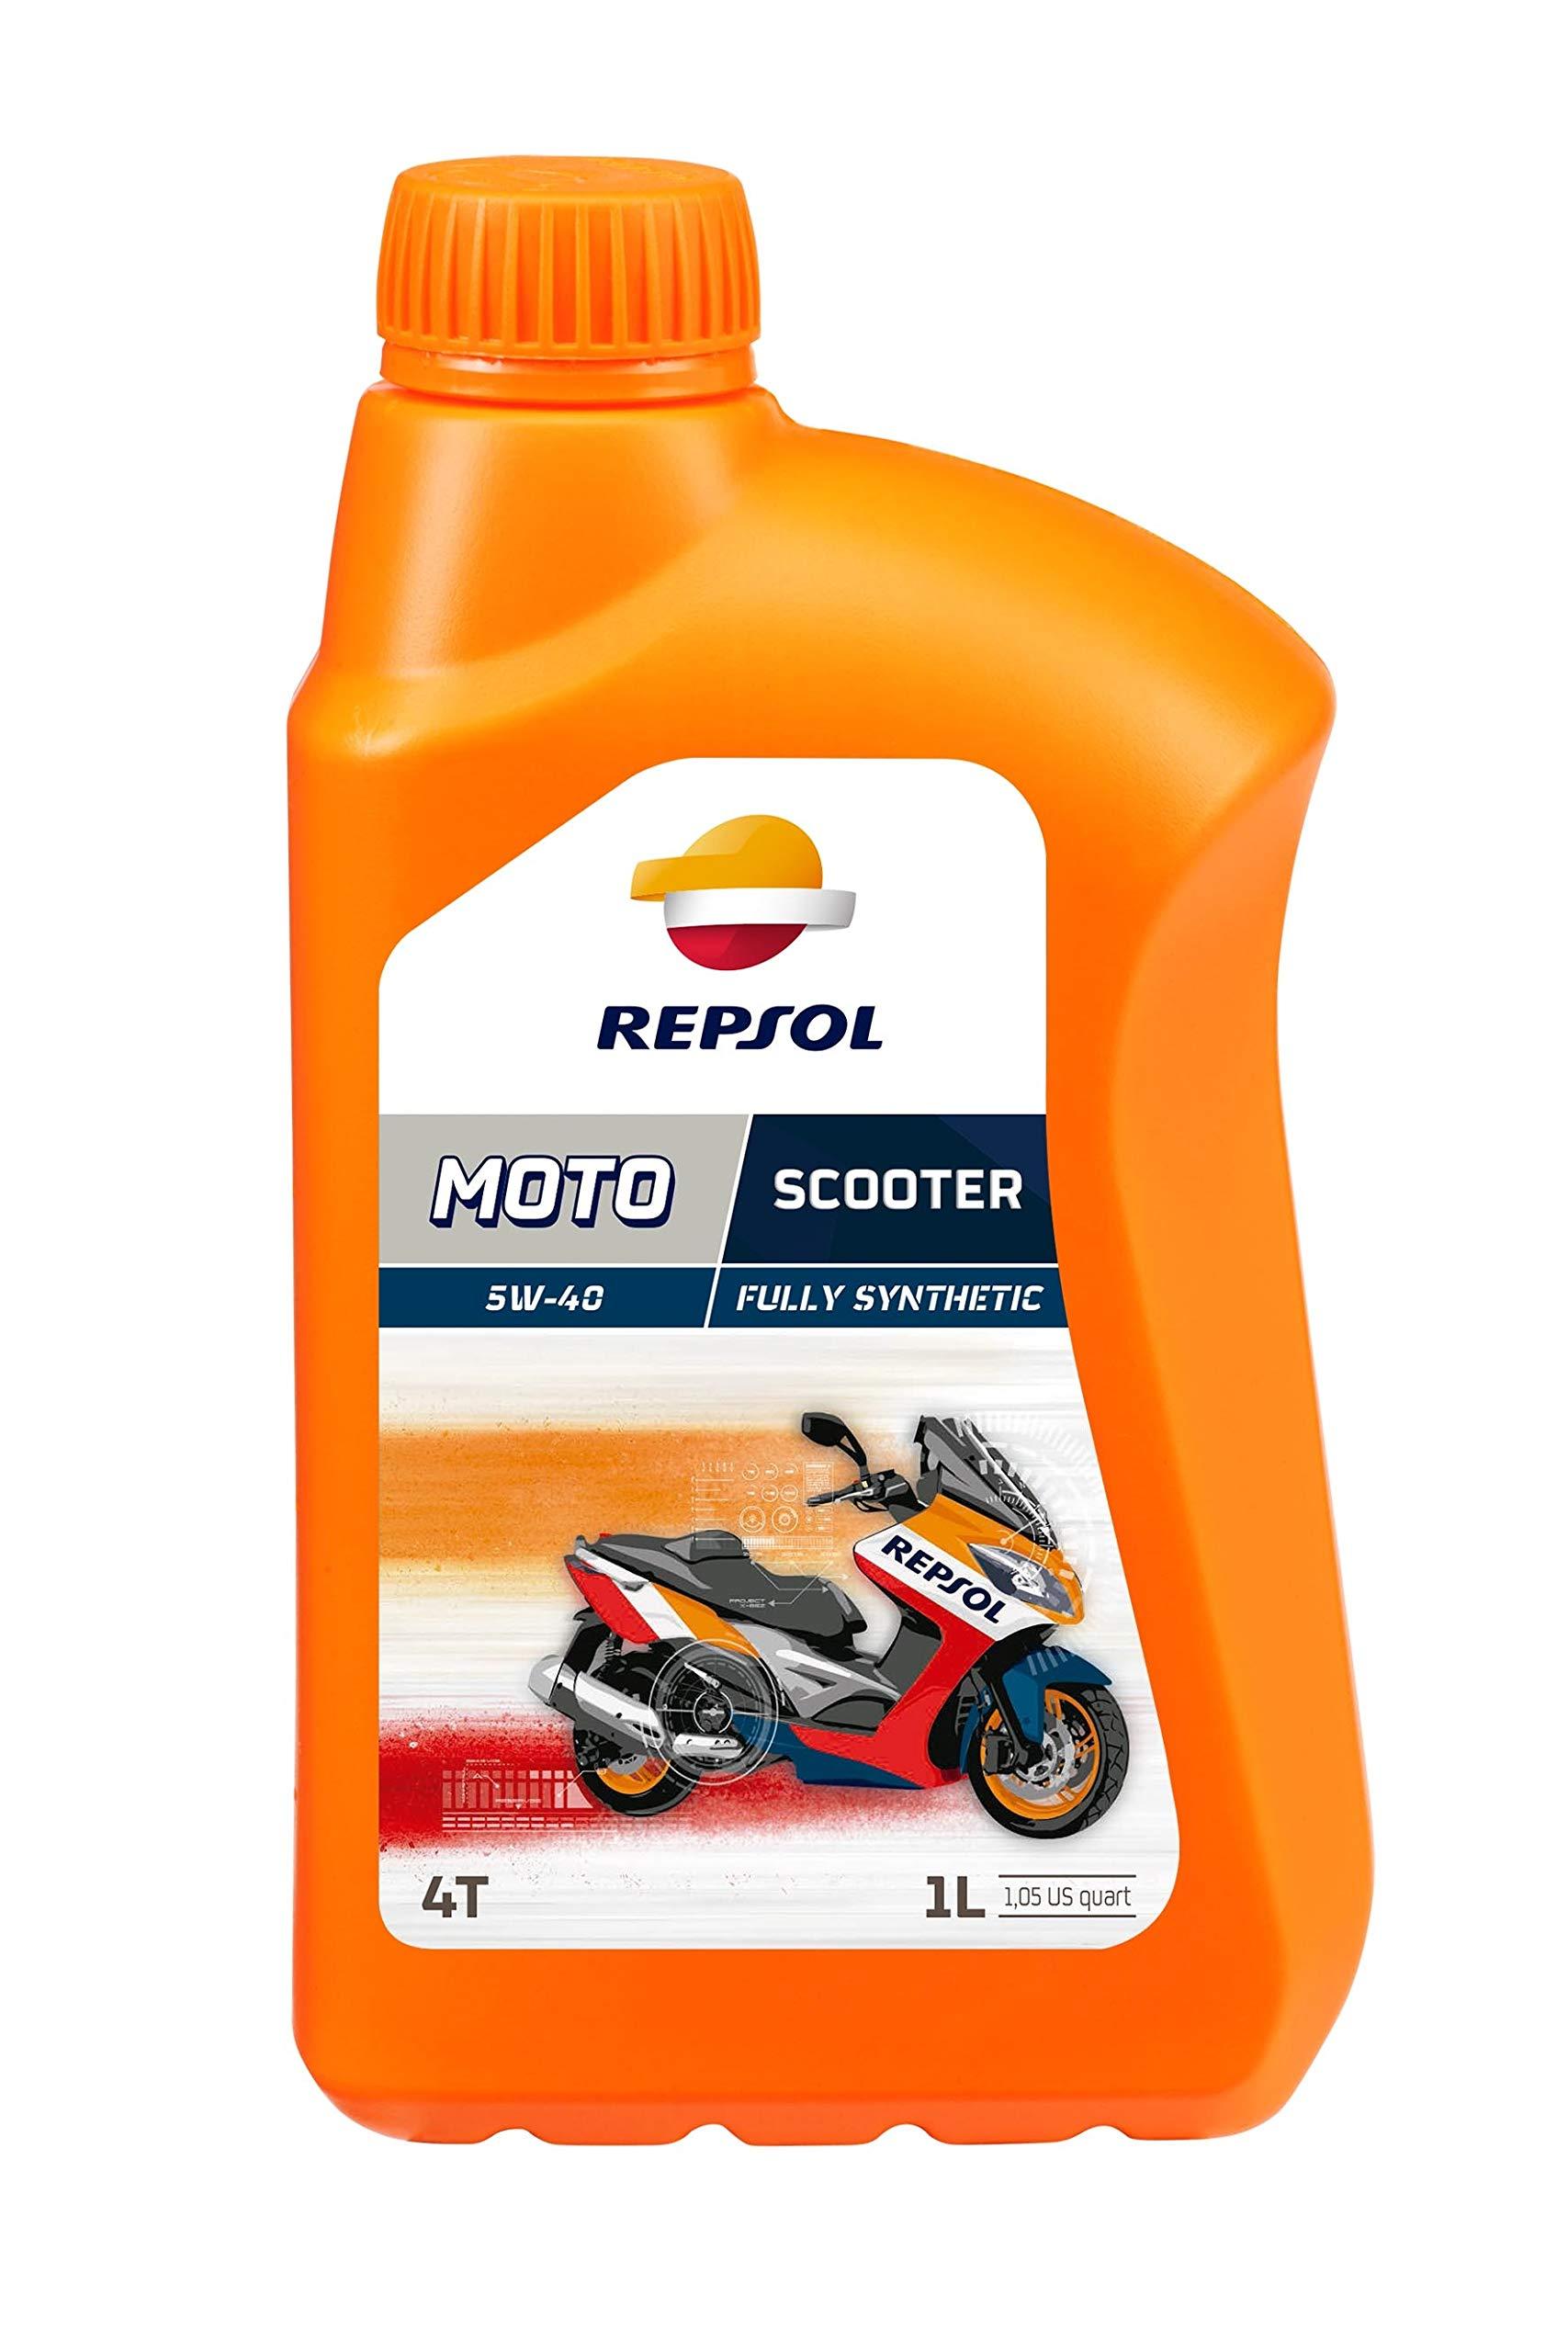 Repsol RP164L51 Moto Scooter 4T 5W-40 Aceite de Motor, Multicolor, 1 L: Amazon.es: Coche y moto